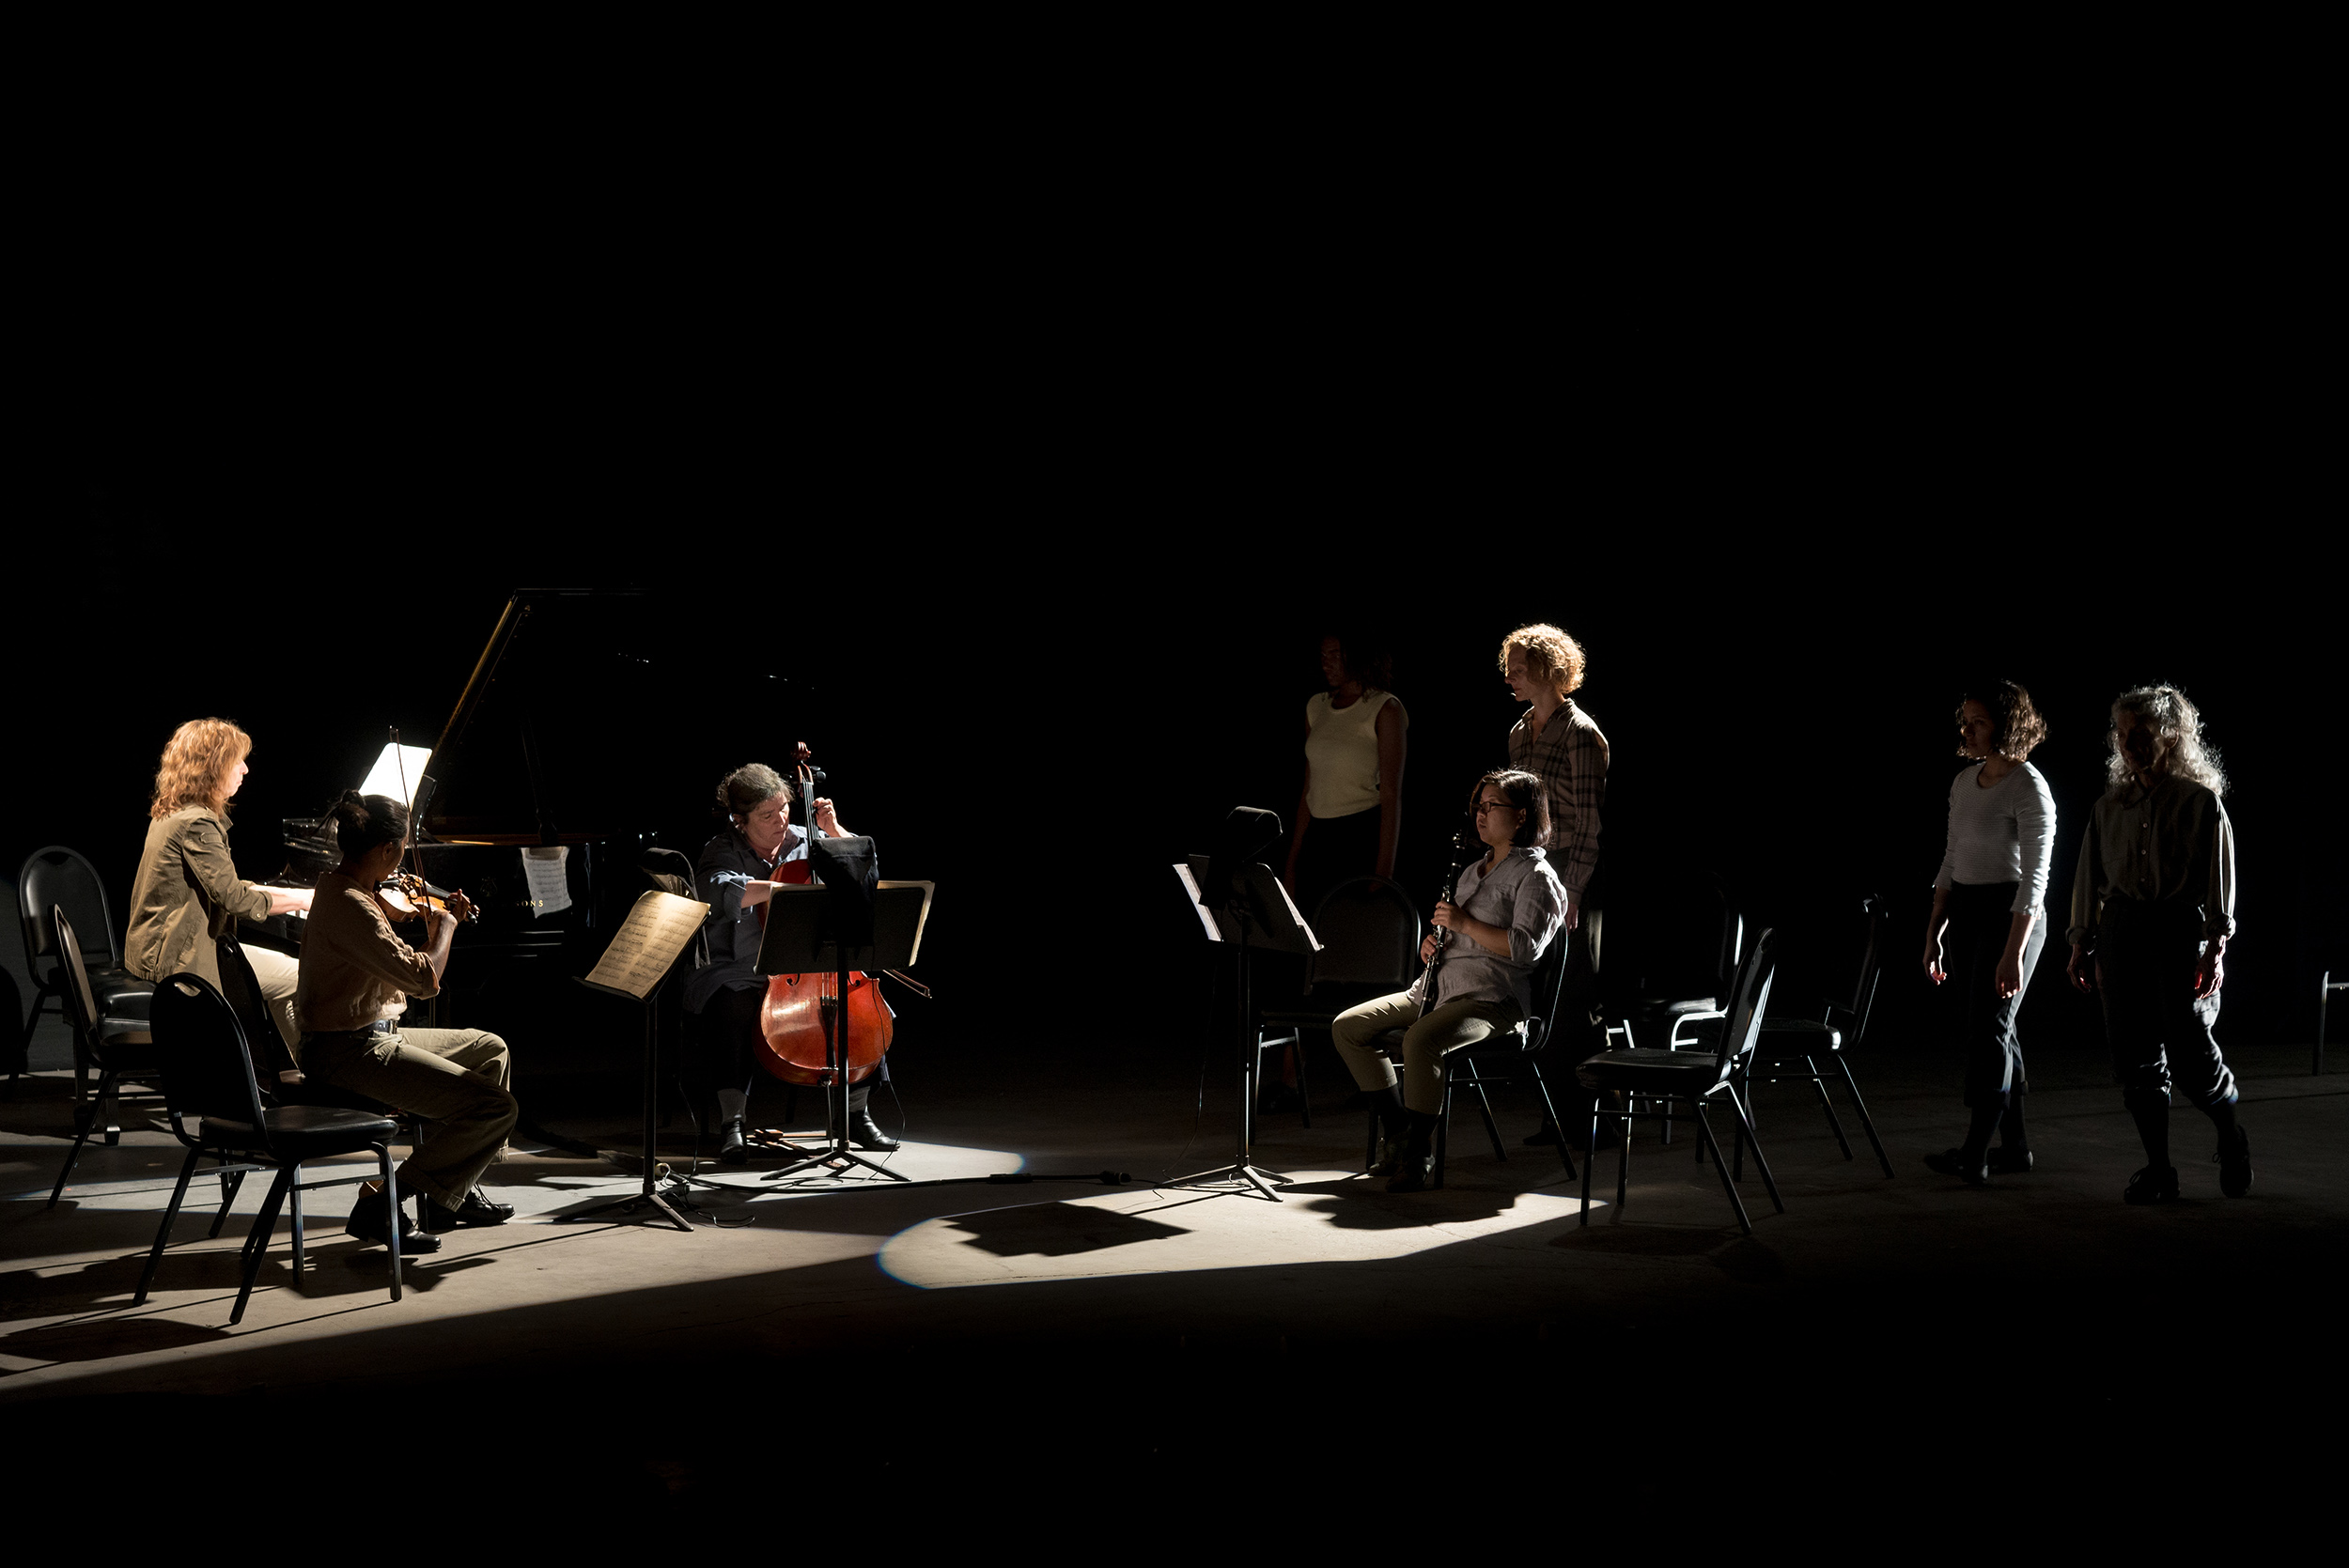 quartet_5.jpg